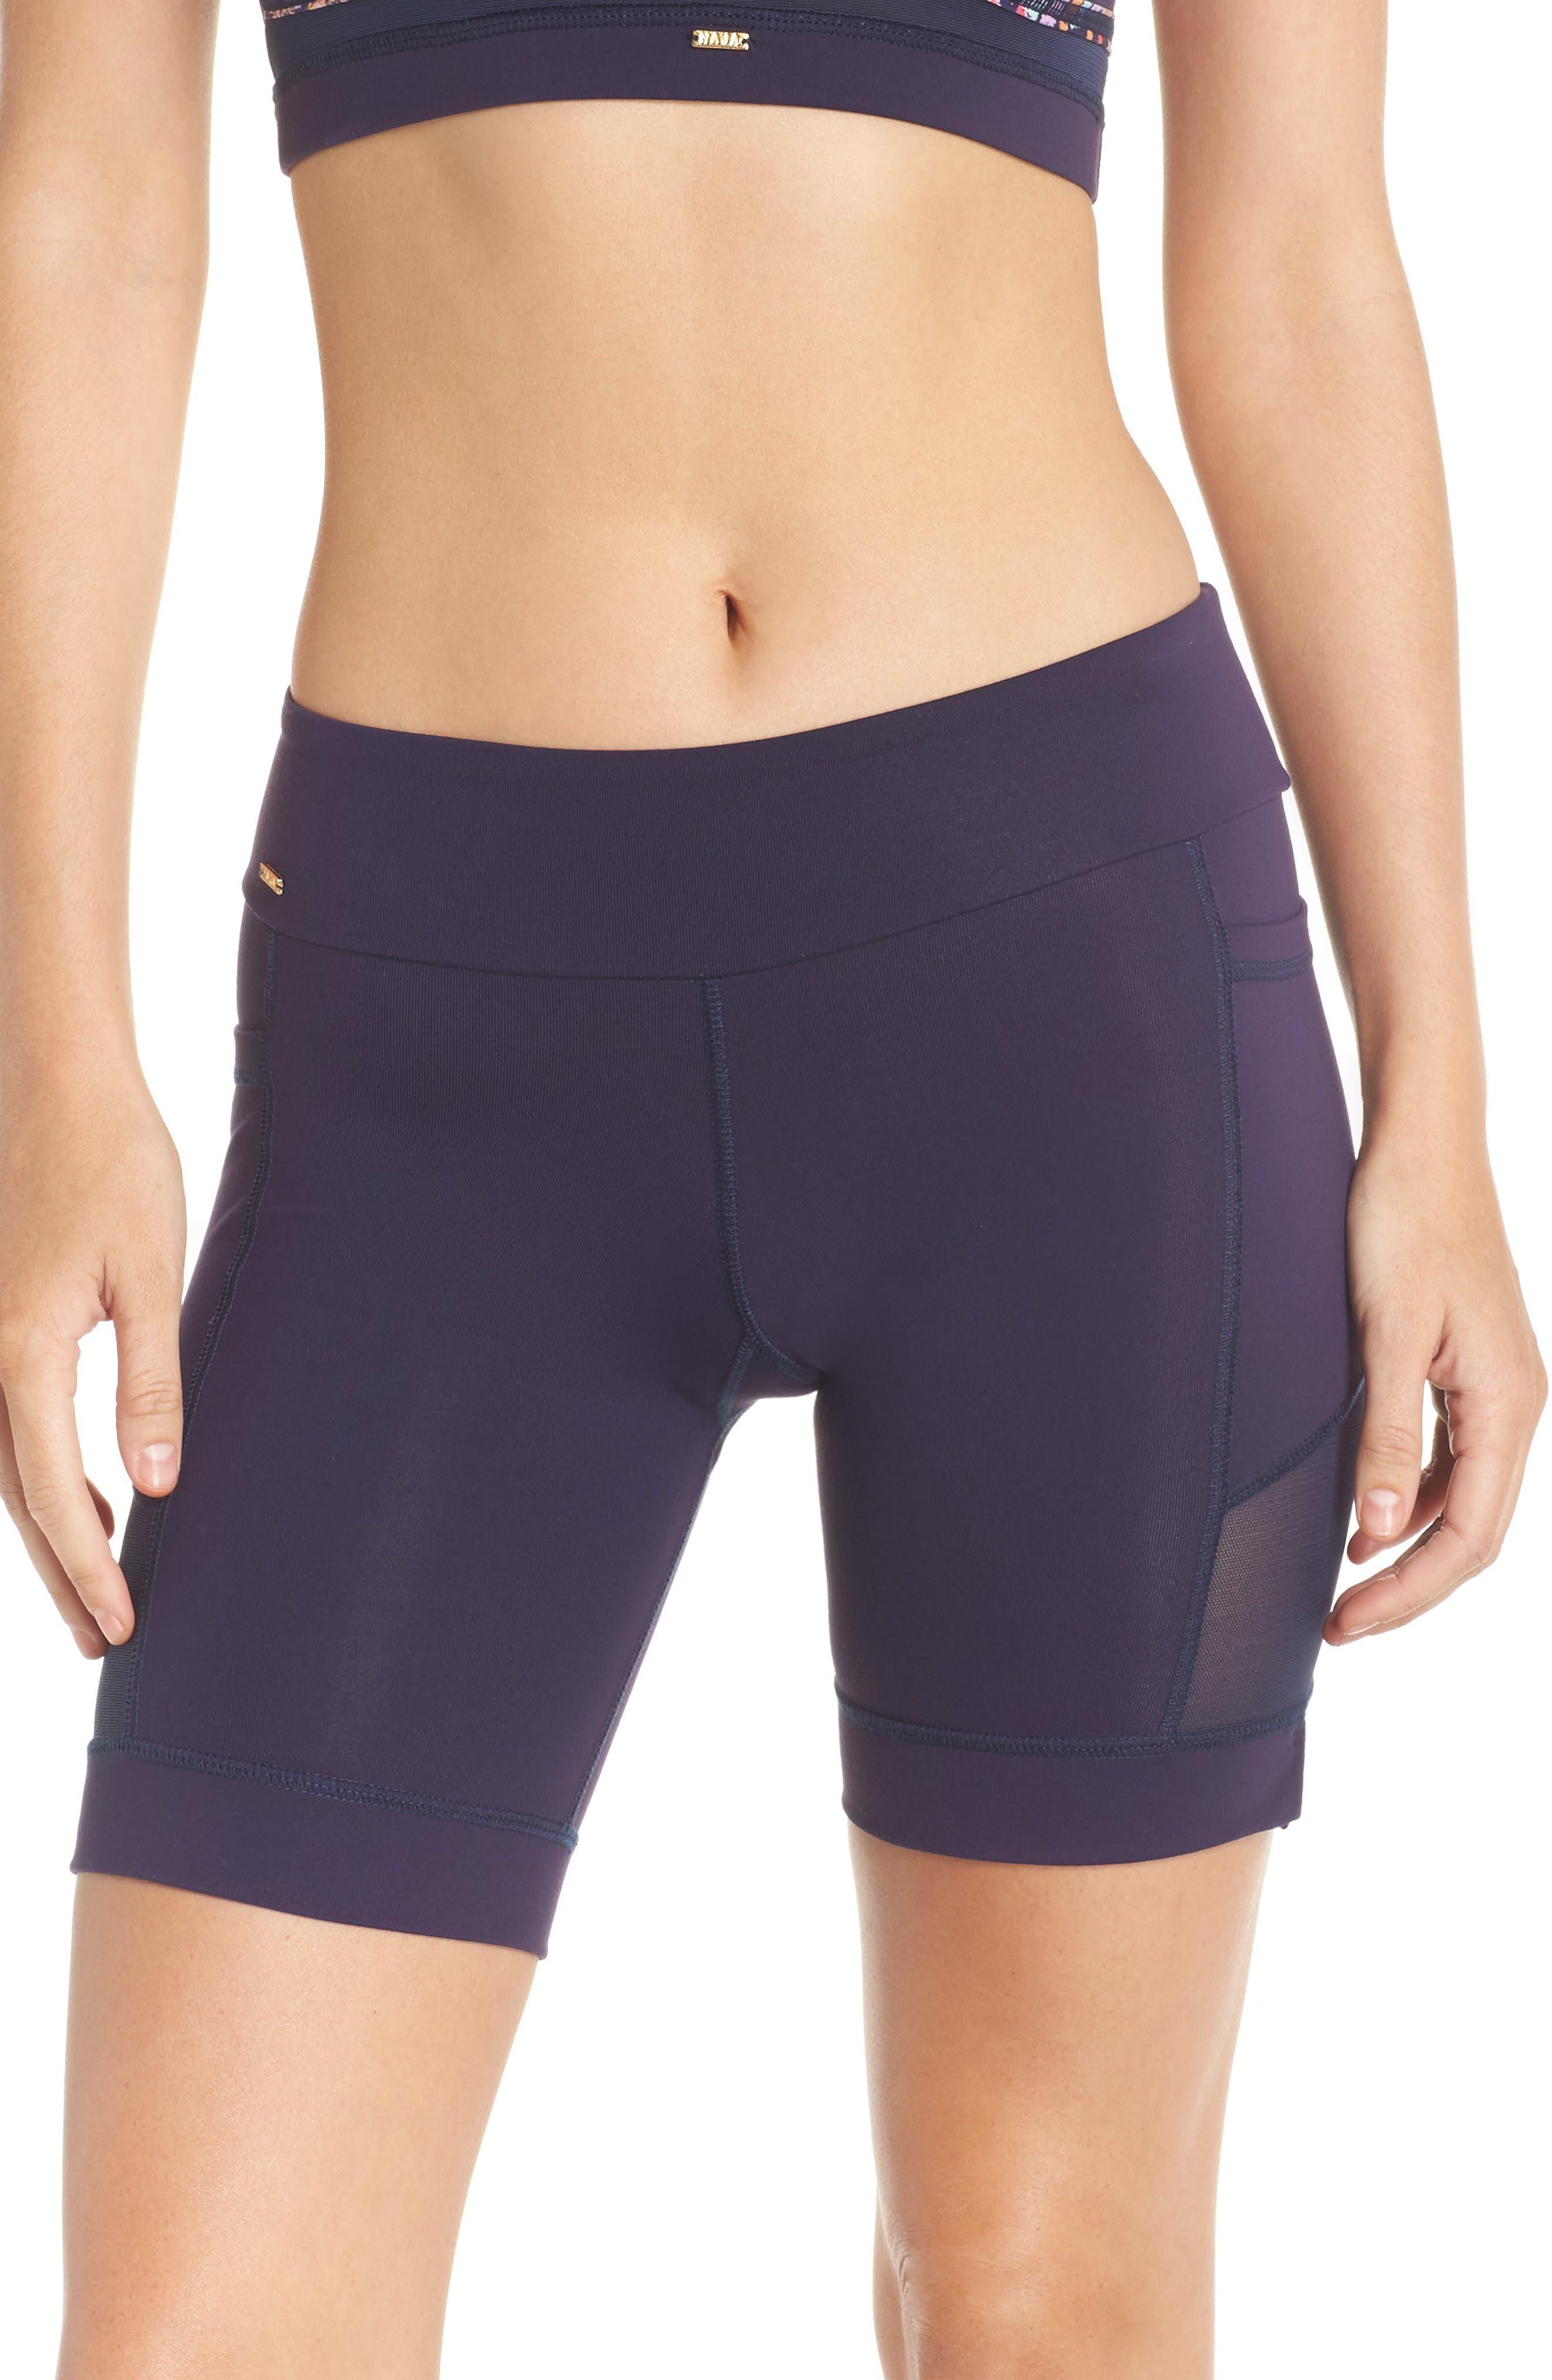 Nicole Active Shorts,                         Main,                         color, Navy Mesh